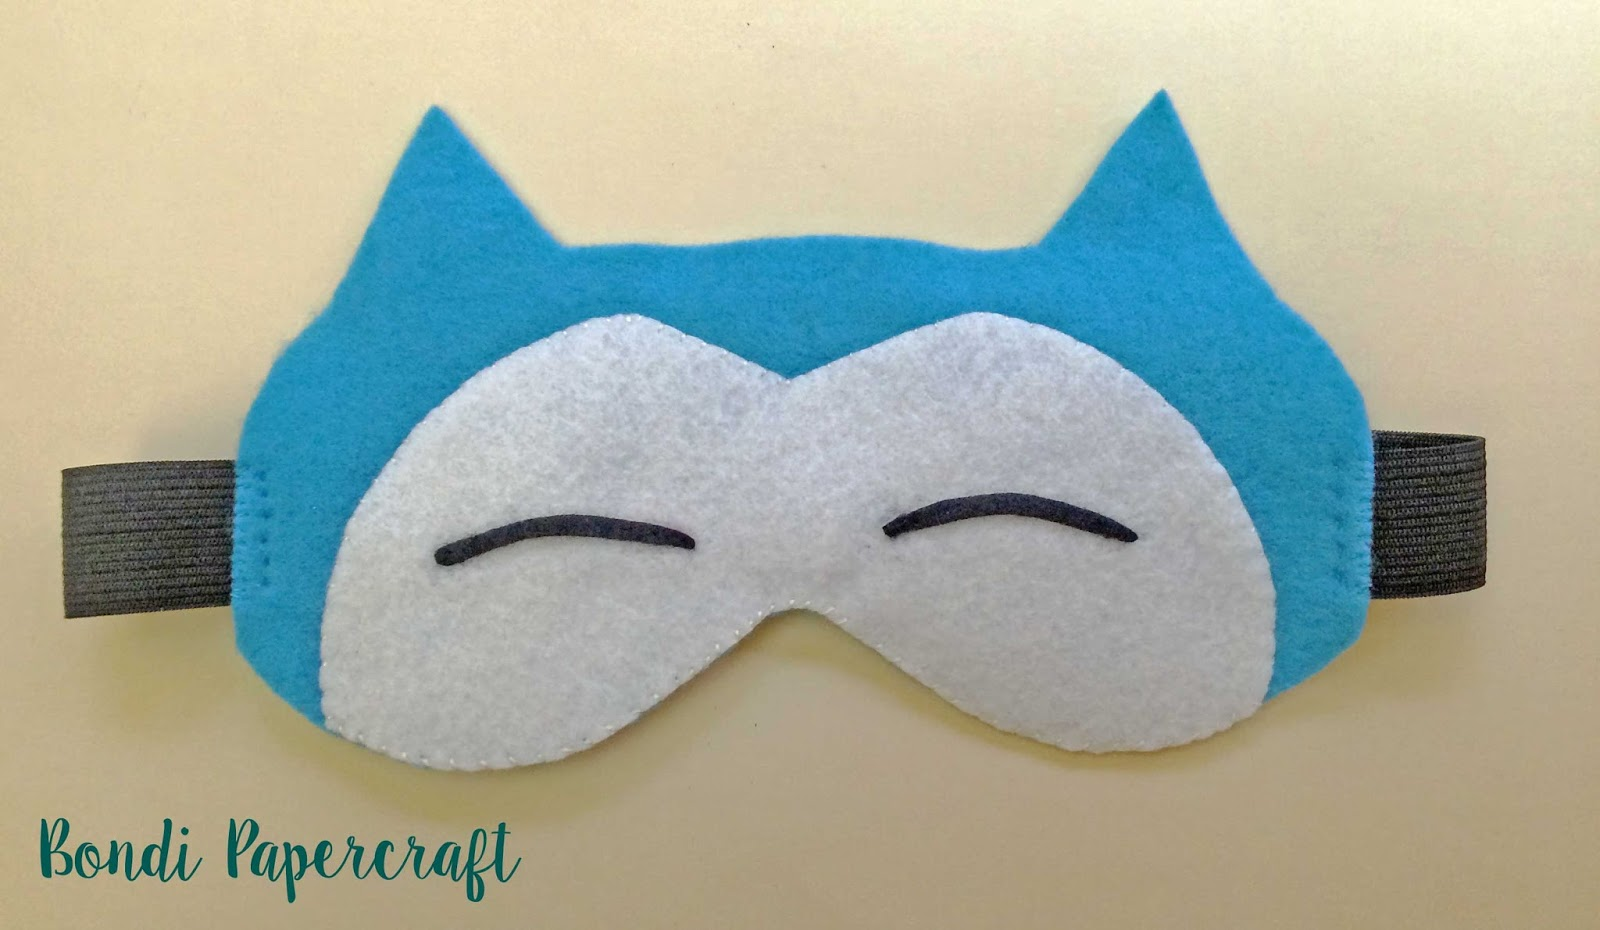 photograph relating to Pokemon Mask Printable titled Bondi Papercraft: Snorlax Eye Mask